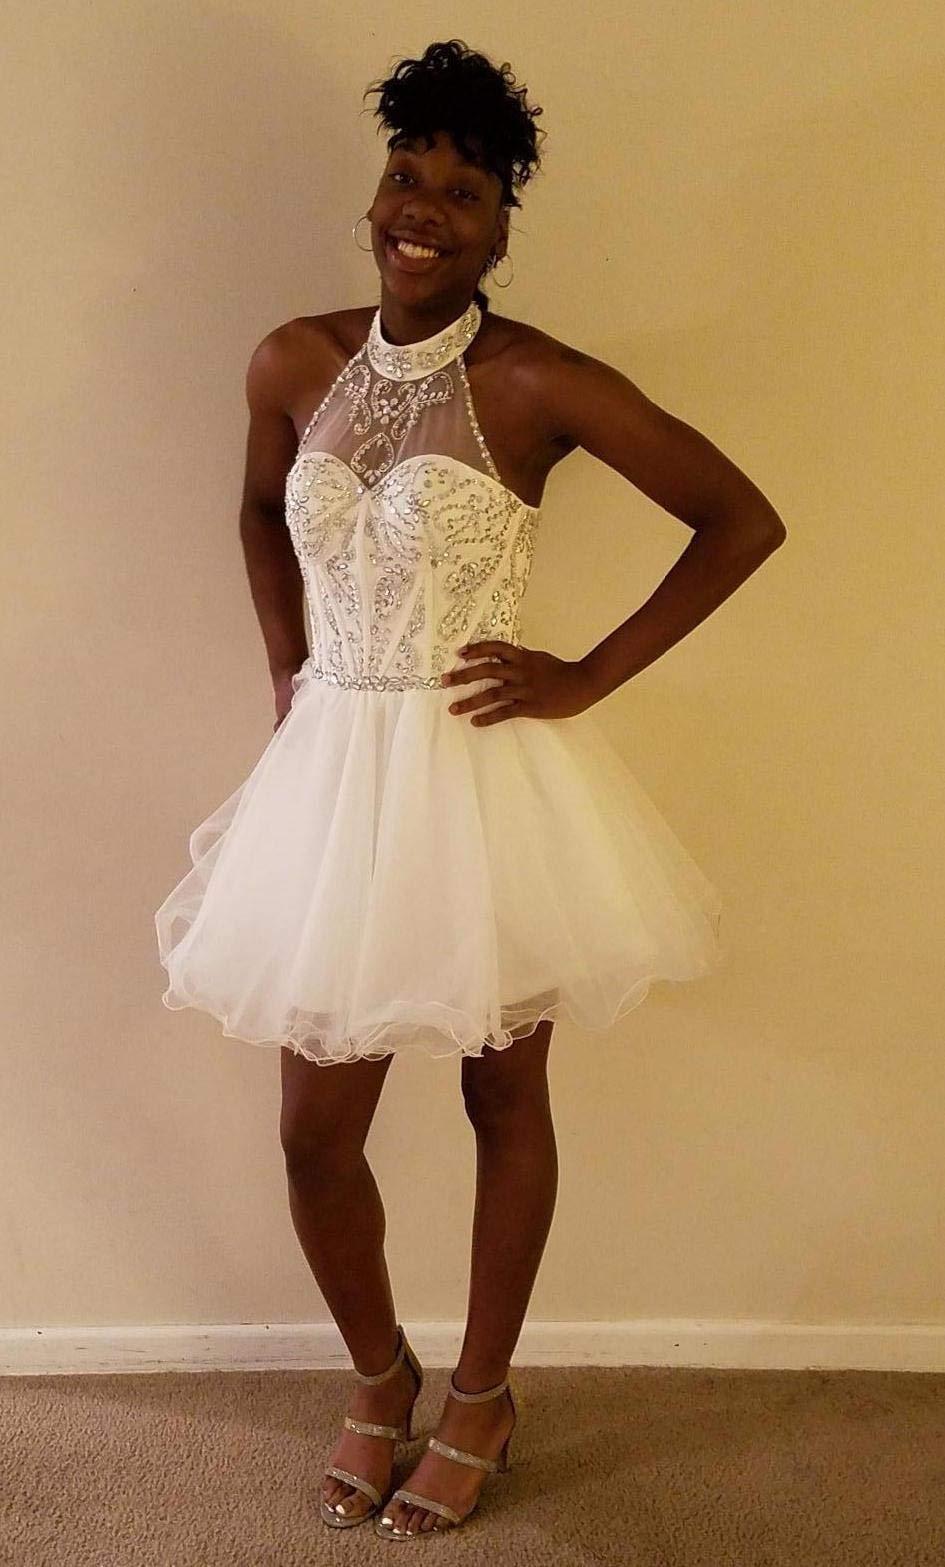 94e585a46e7 Home Prom Dresses OYISHA Women s Short Beading Halter Homecoming Prom  Dresses Backless Ivory 2.   